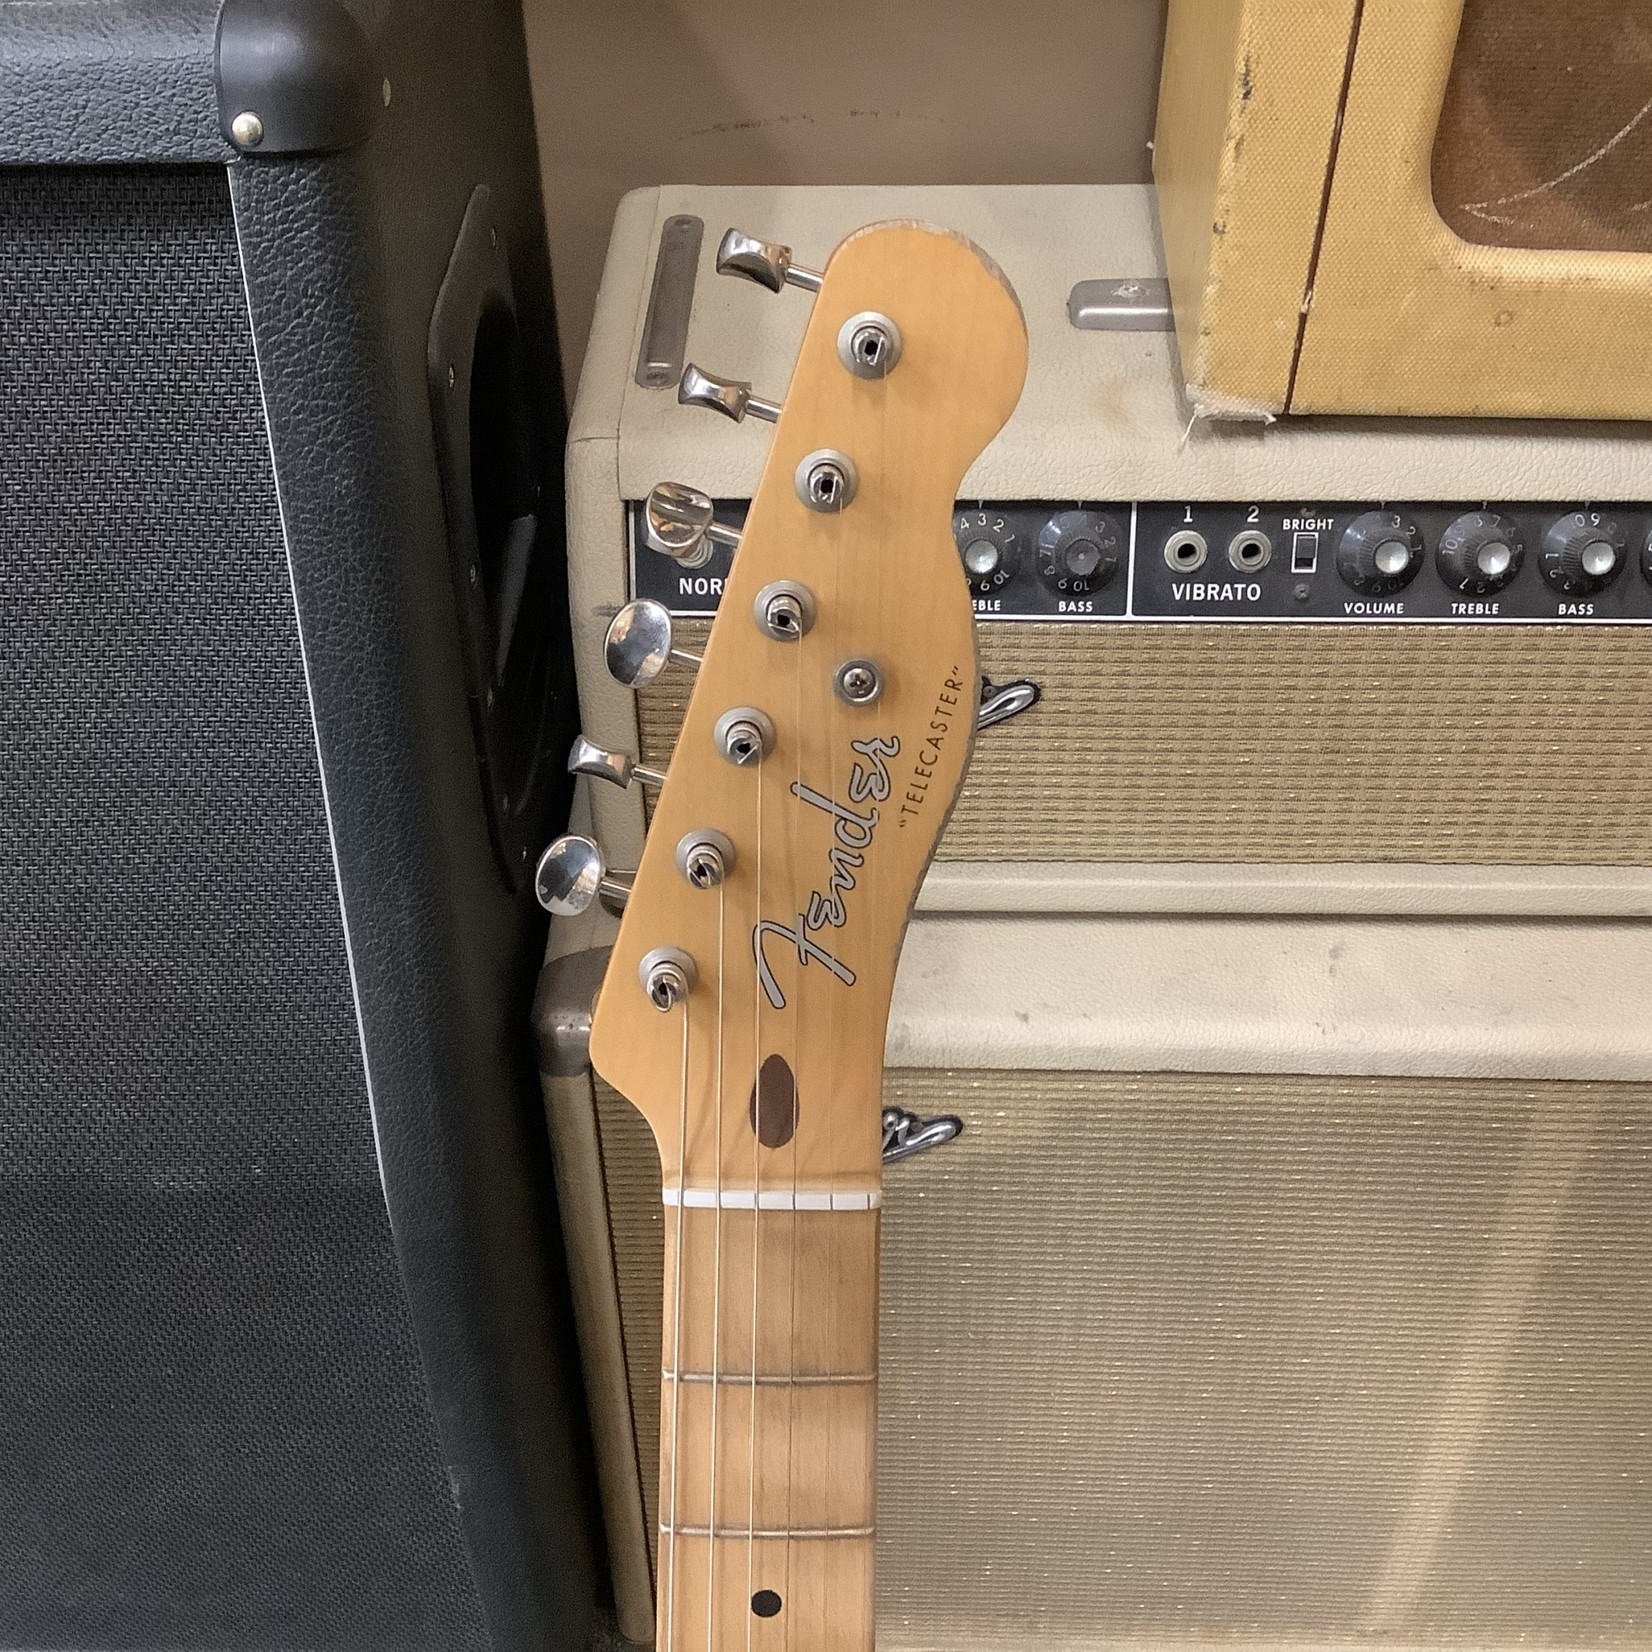 Fender Brand New Fender MX Roadworn 50's Telecaster Vintage Blond 75th Anniversary Vintera